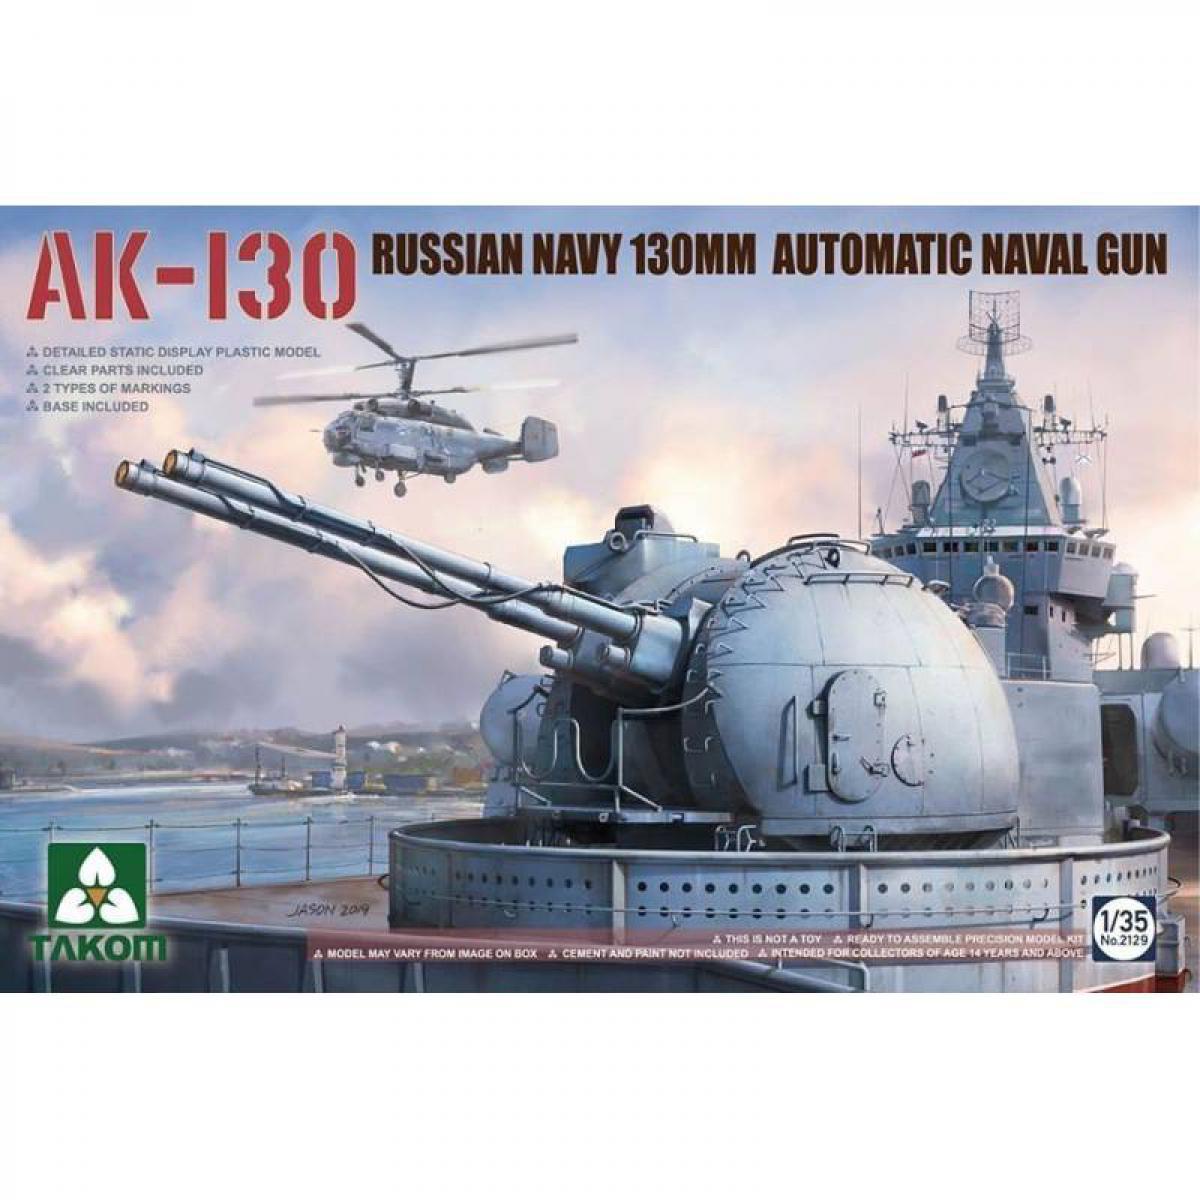 Takom Maquette Lance Missile Ak-130 Russian Navy 130mm Automatic Naval Gun